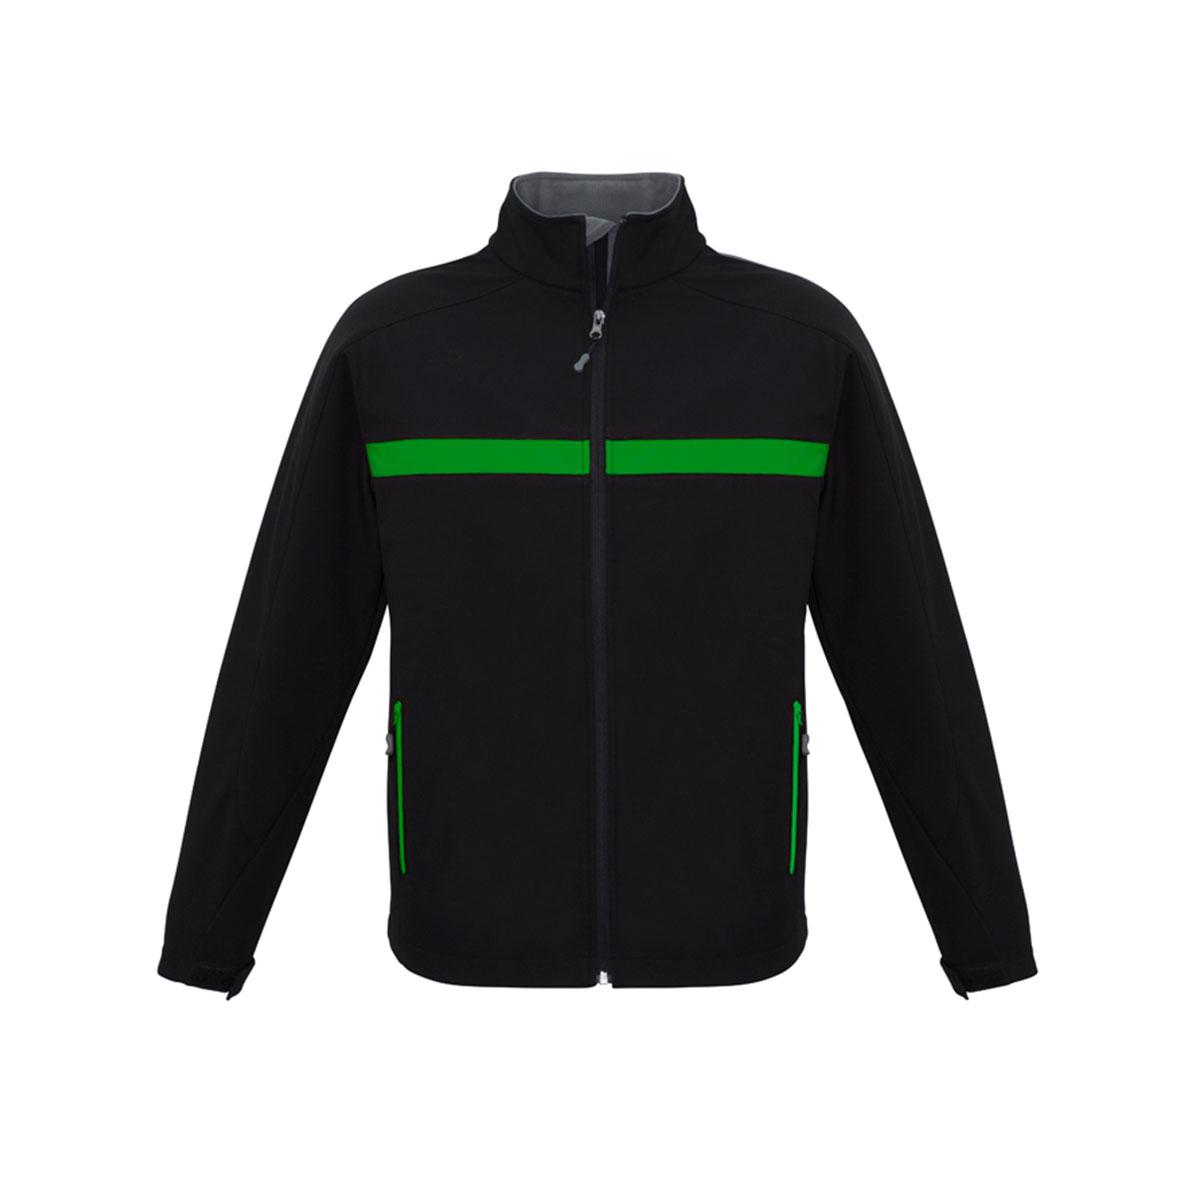 Unisex Charger Jacket-Black / Green / Grey